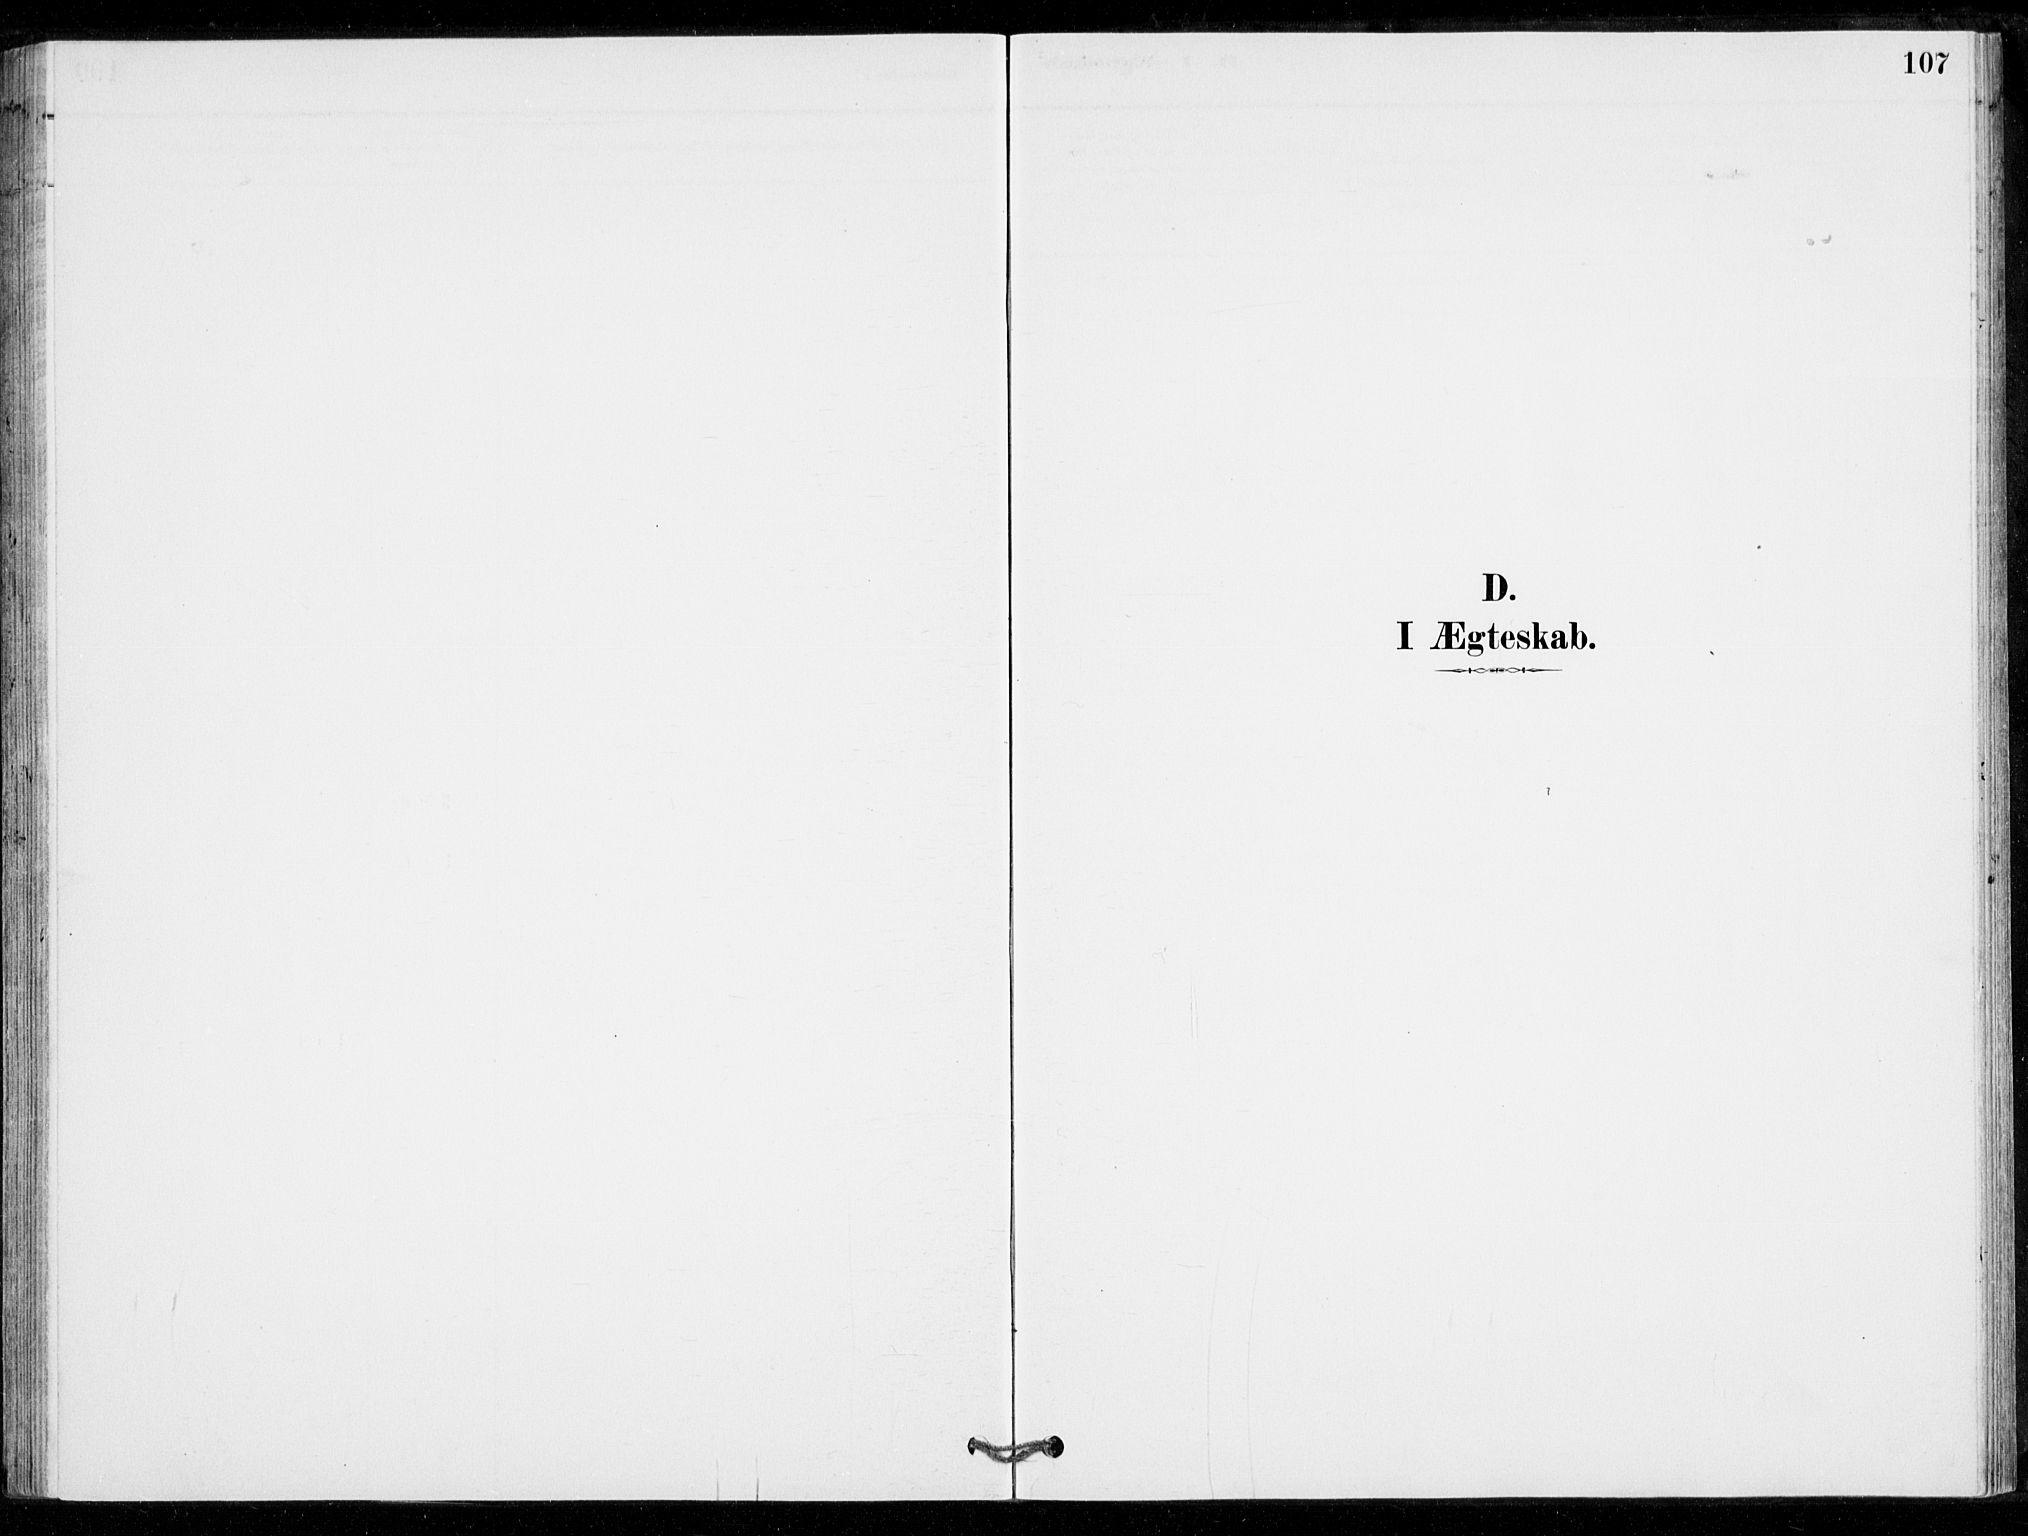 SAKO, Nore kirkebøker, G/Gc/L0003: Klokkerbok nr. III 3, 1881-1941, s. 107